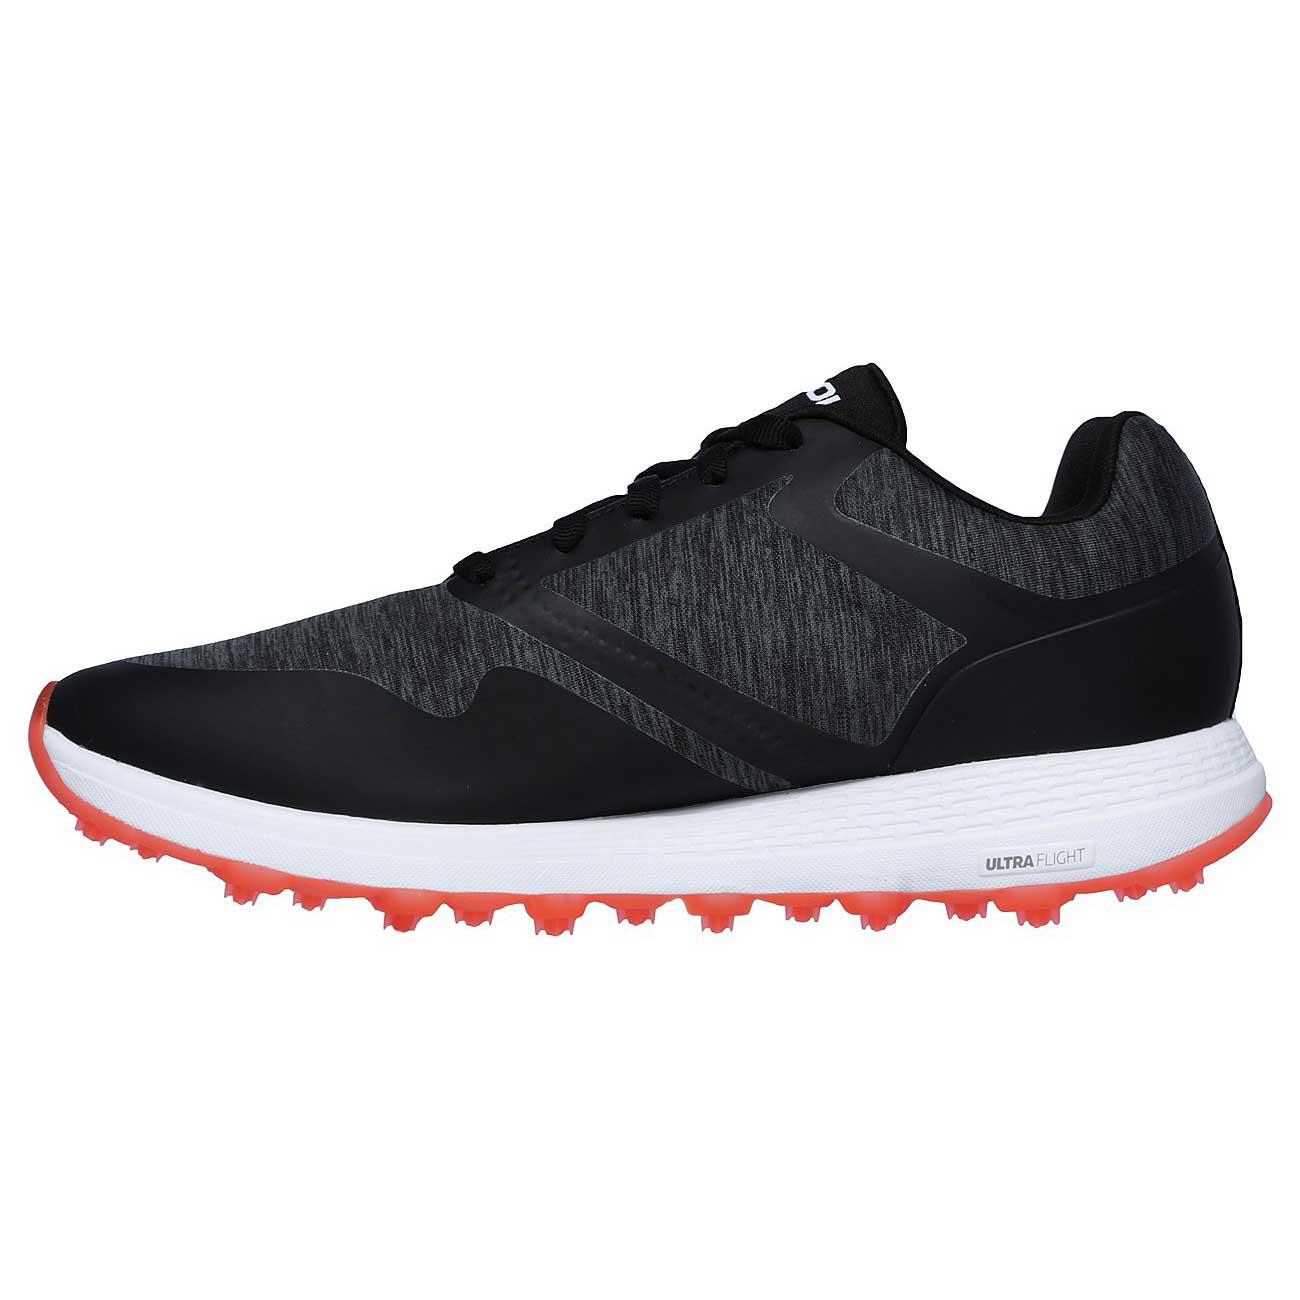 Skechers Women's Go Golf Max Cut Black/Pink Golf Shoe